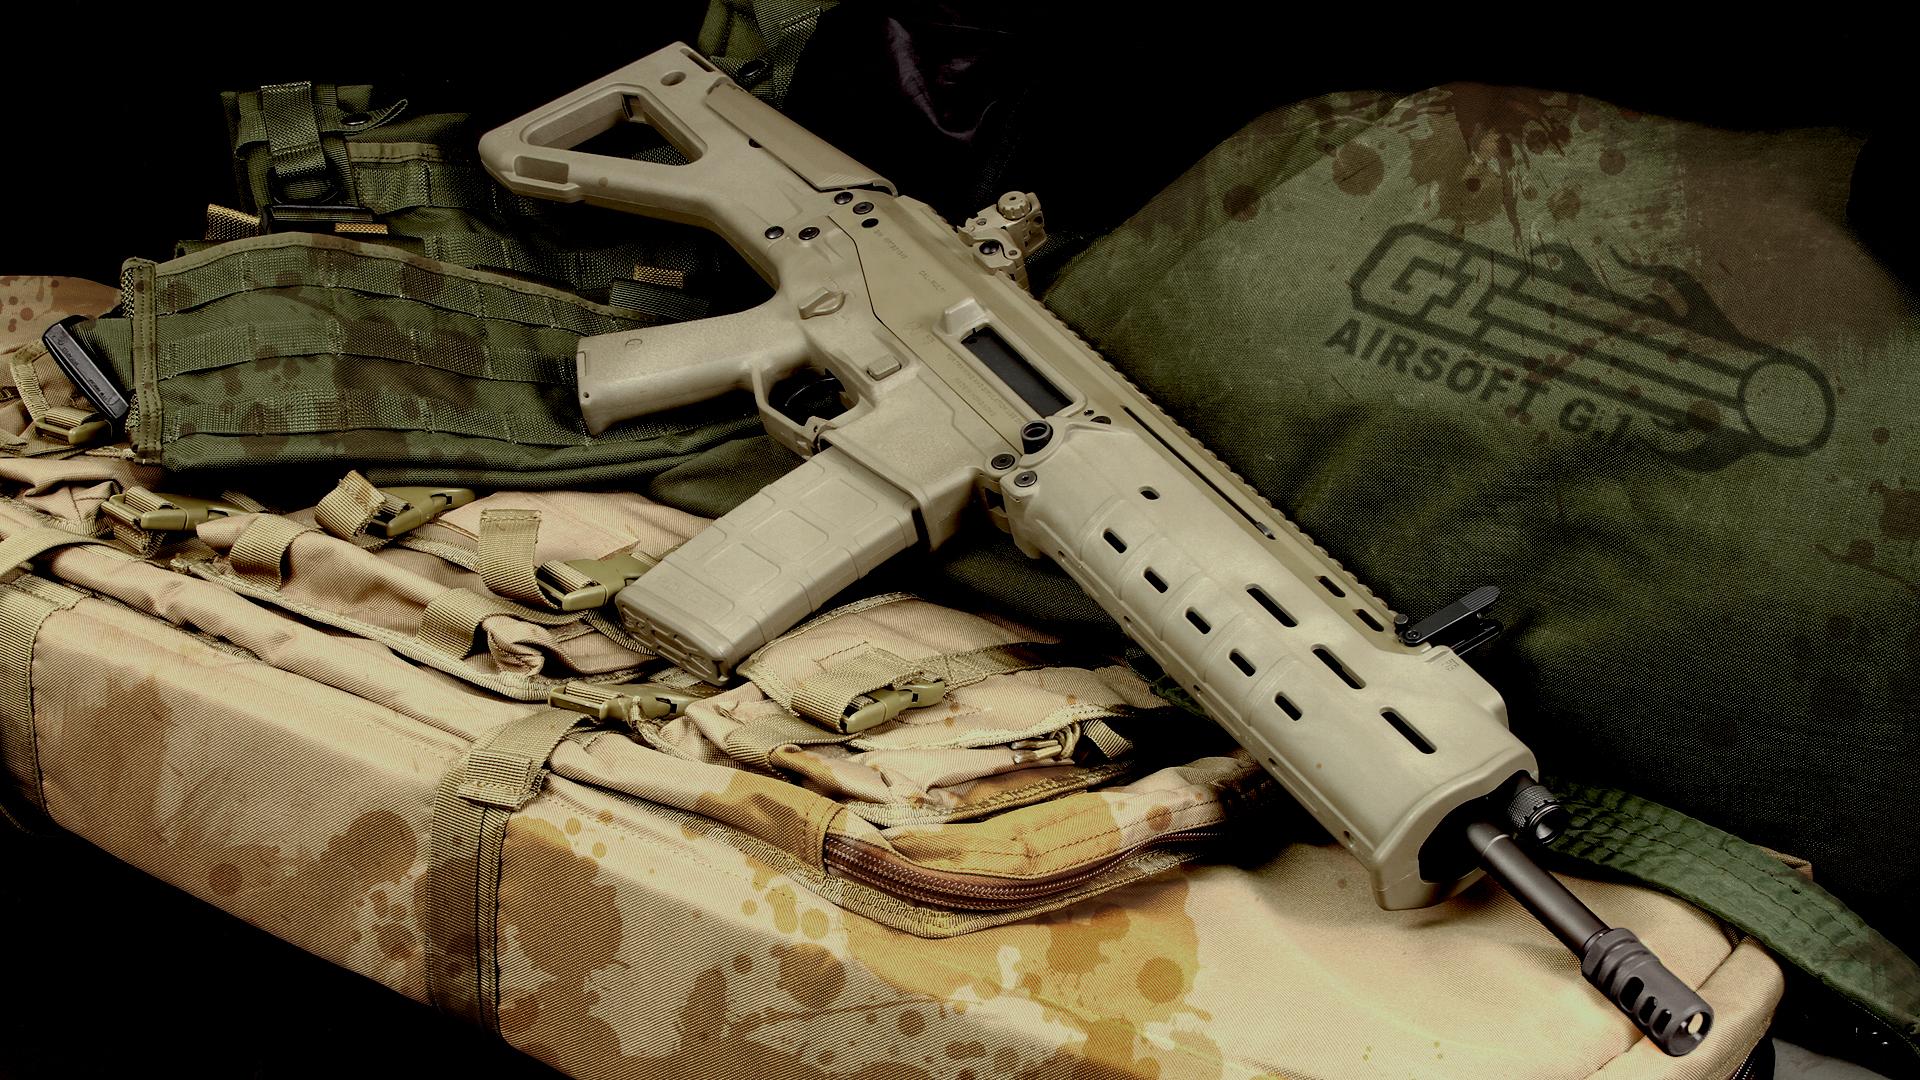 Pubg Scar L Iphone Wallpaper: Assault Rifle HD Wallpaper